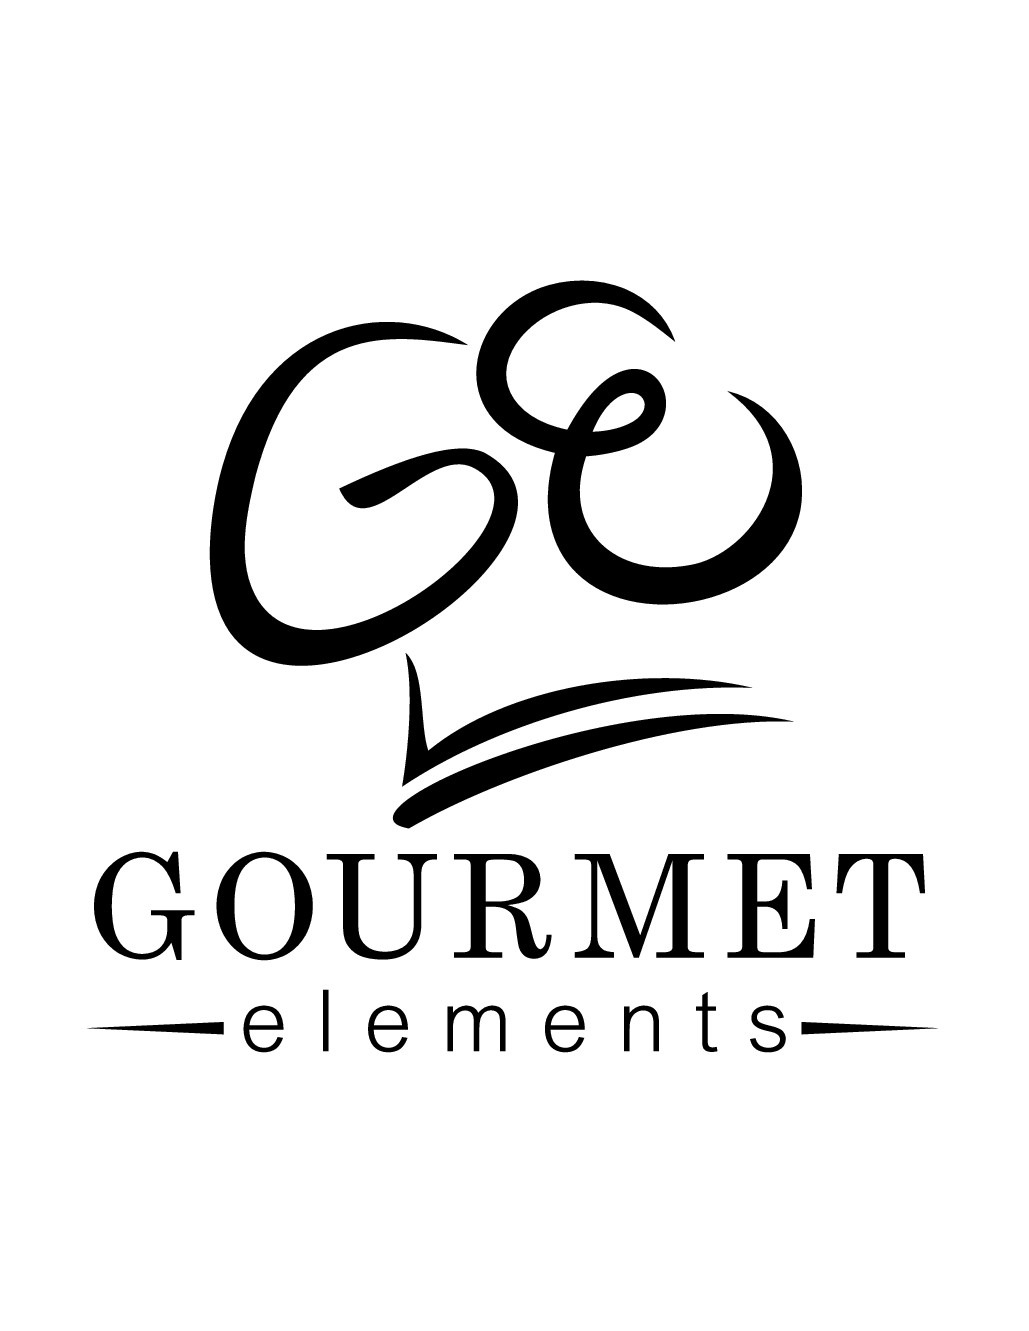 Gourmet Elements Logo Contest